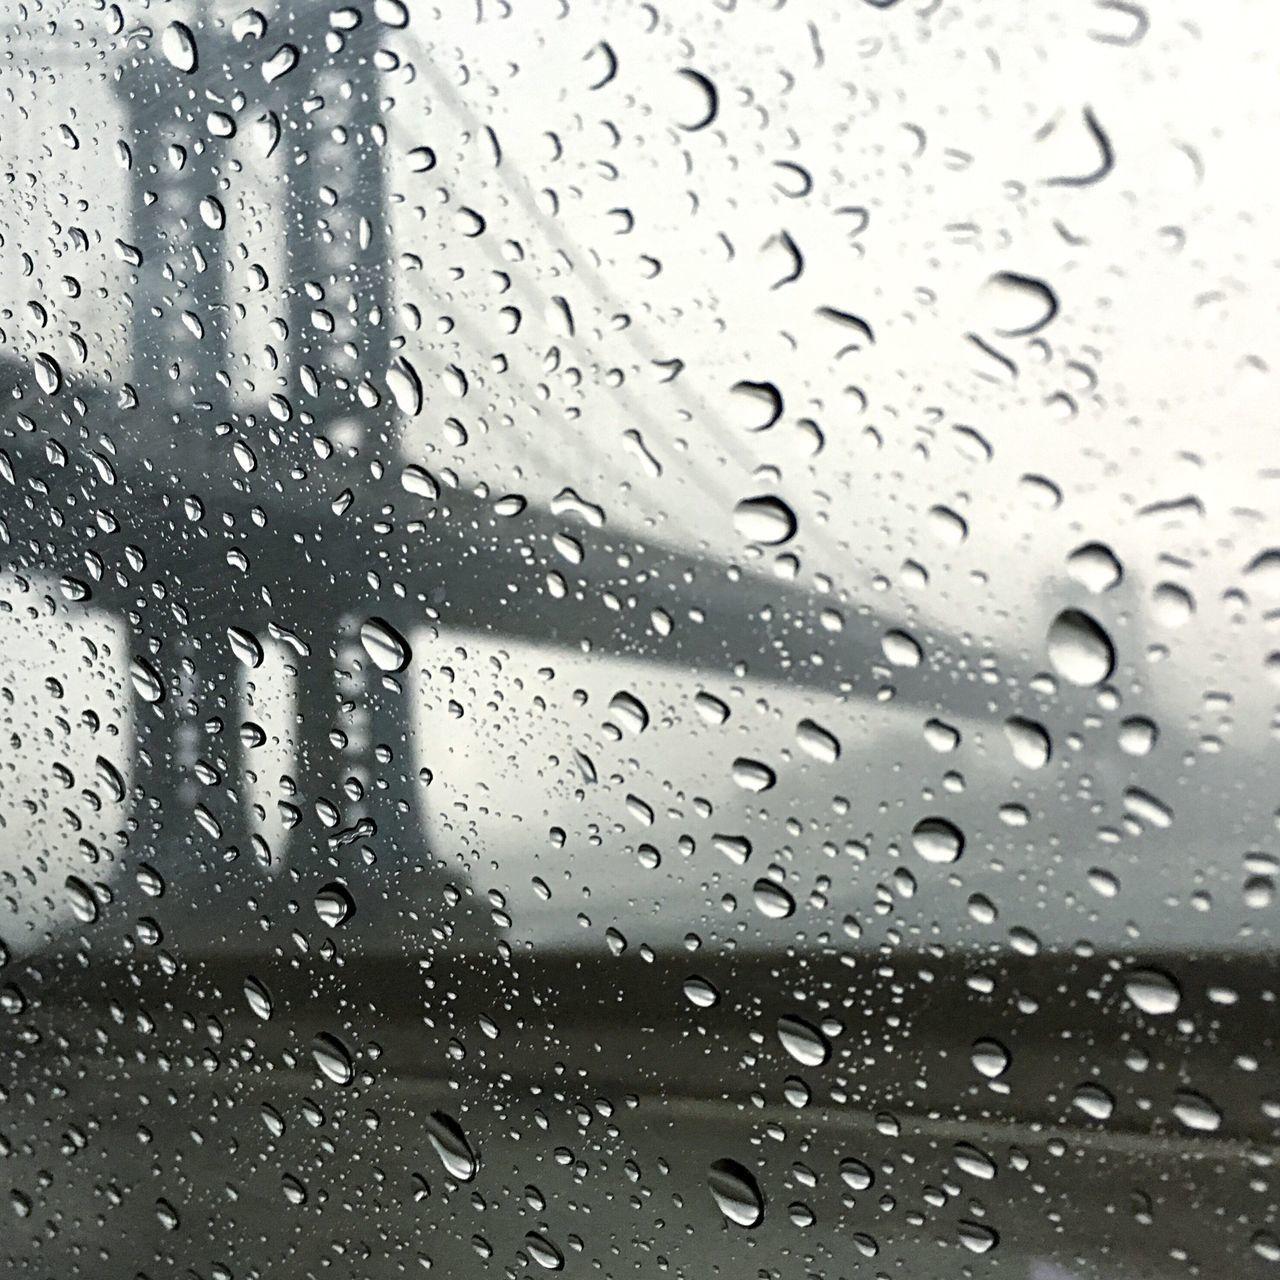 Brooklyn Bridge Rain Season  USA Blackandwhite IPhoneography Weather Battle Of The Cities